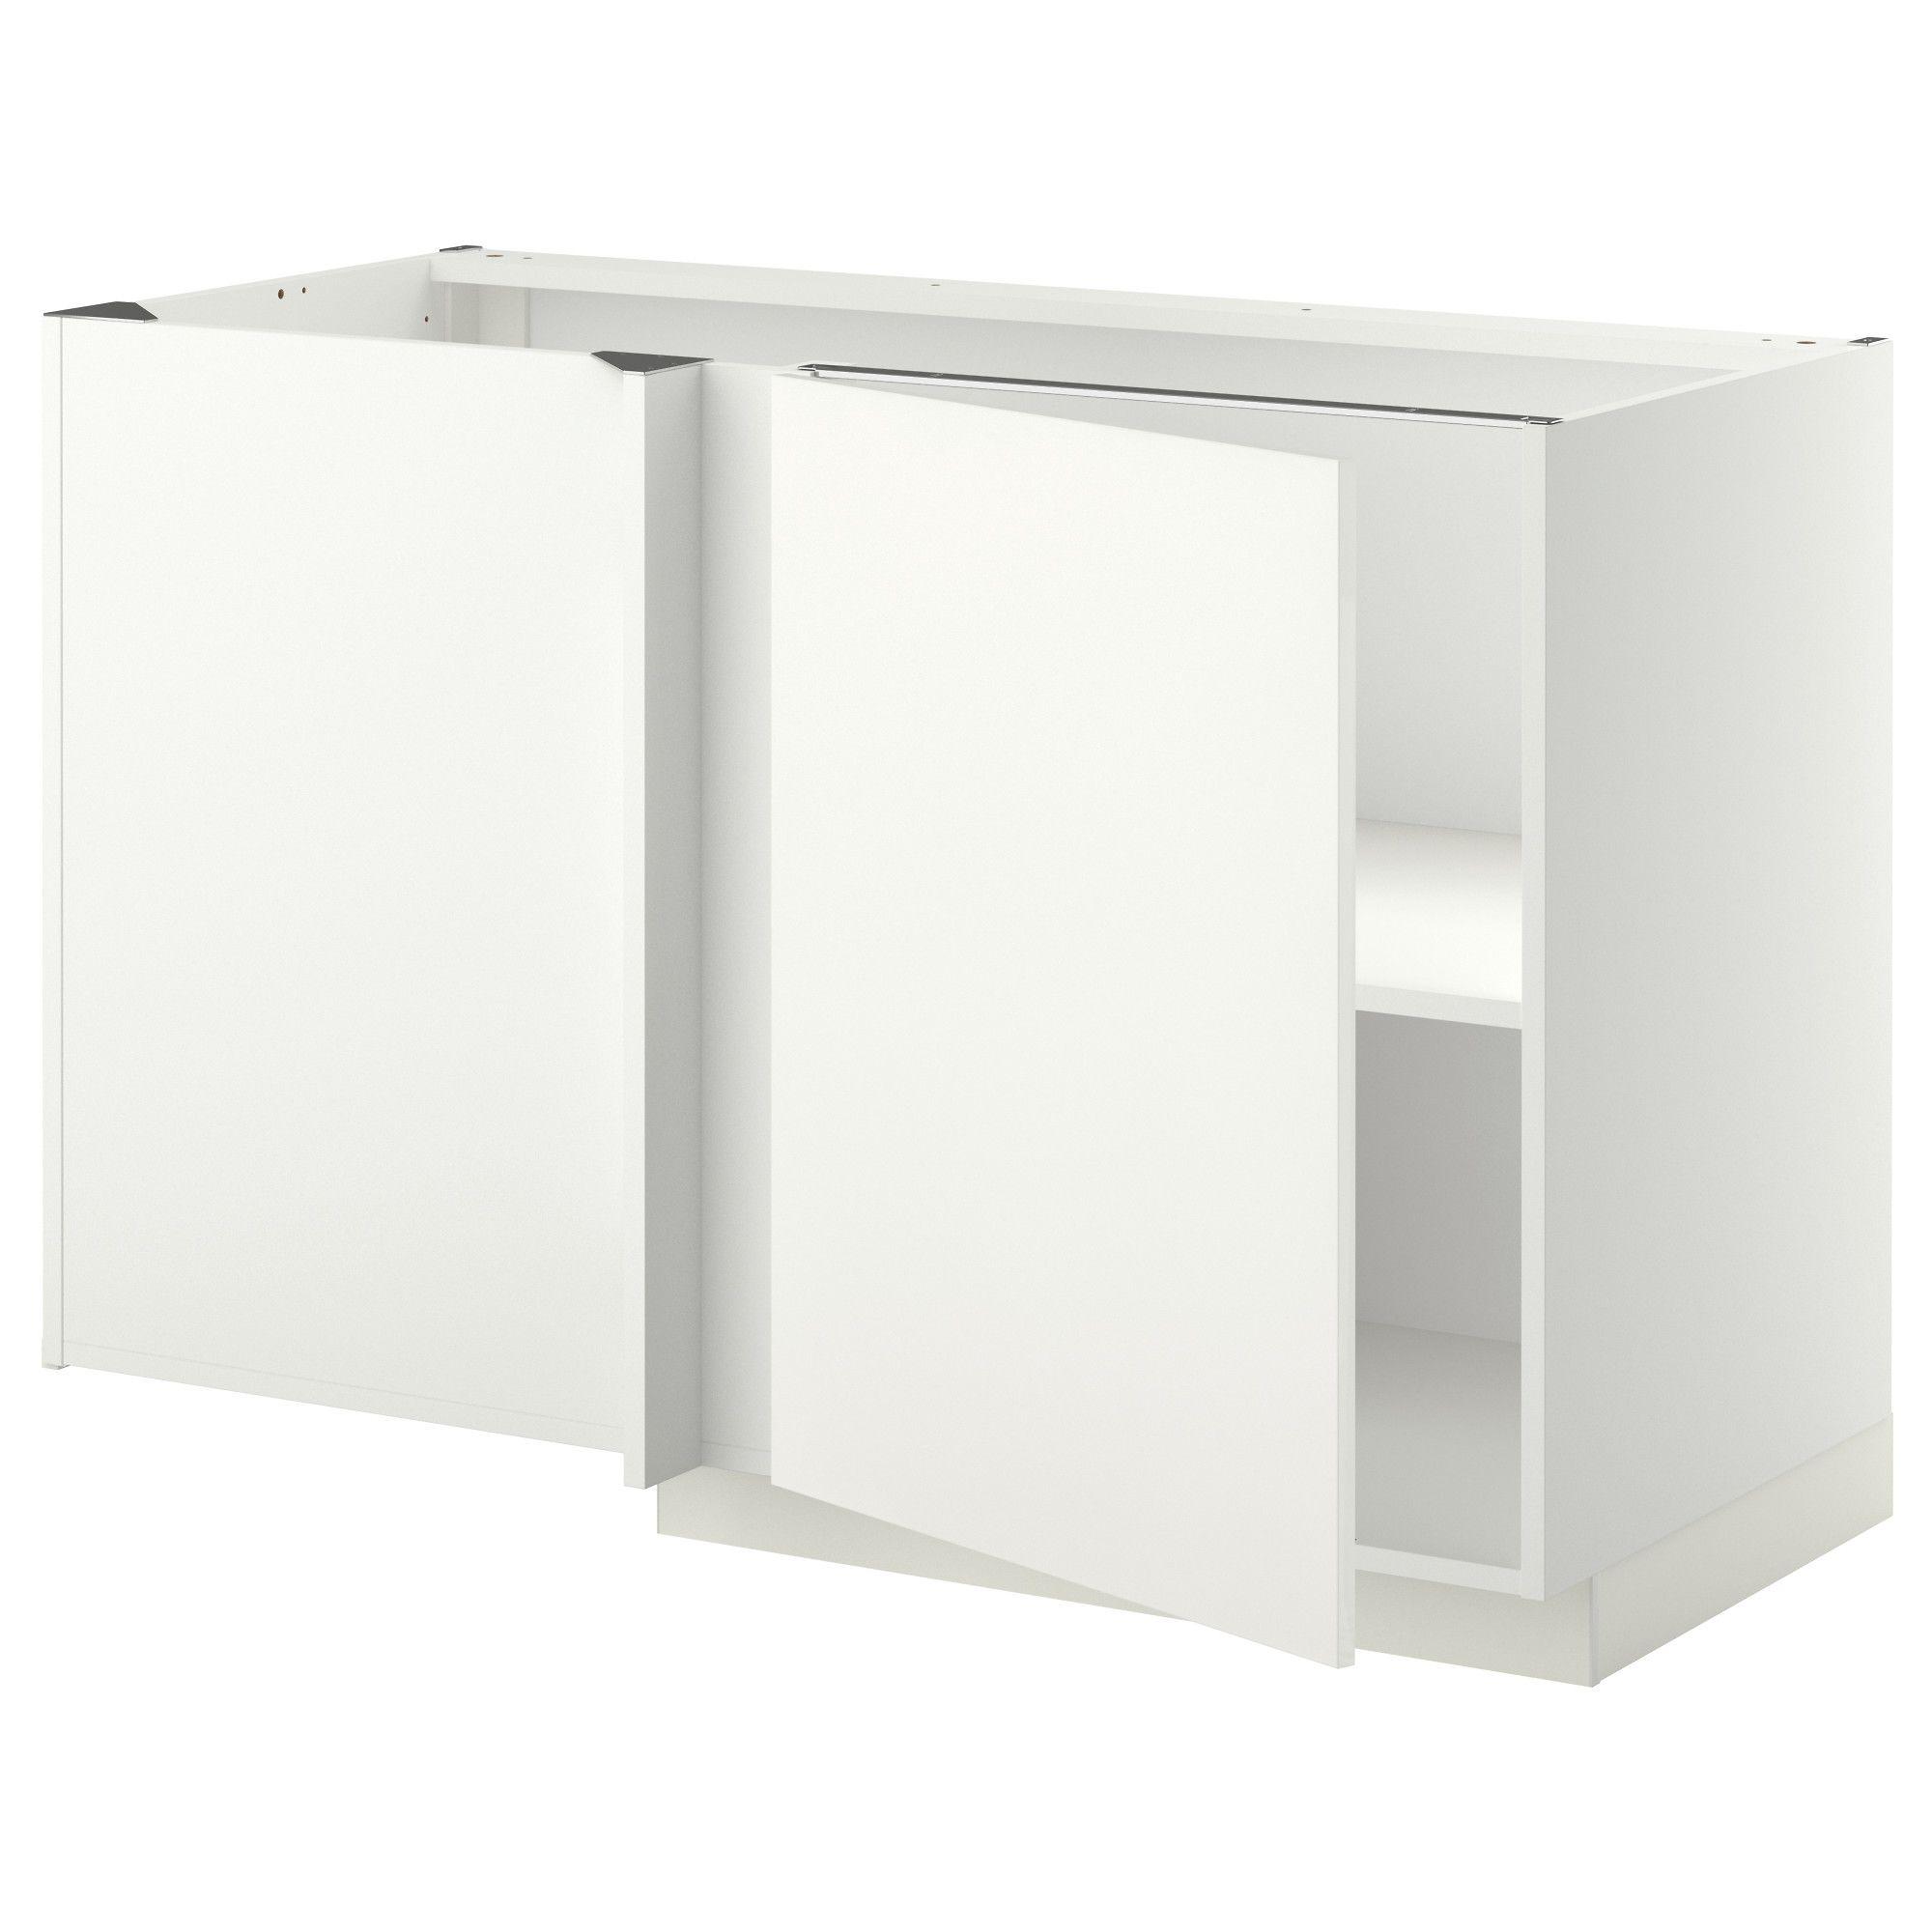 Ikea Metod Unterschrank 30 Cm